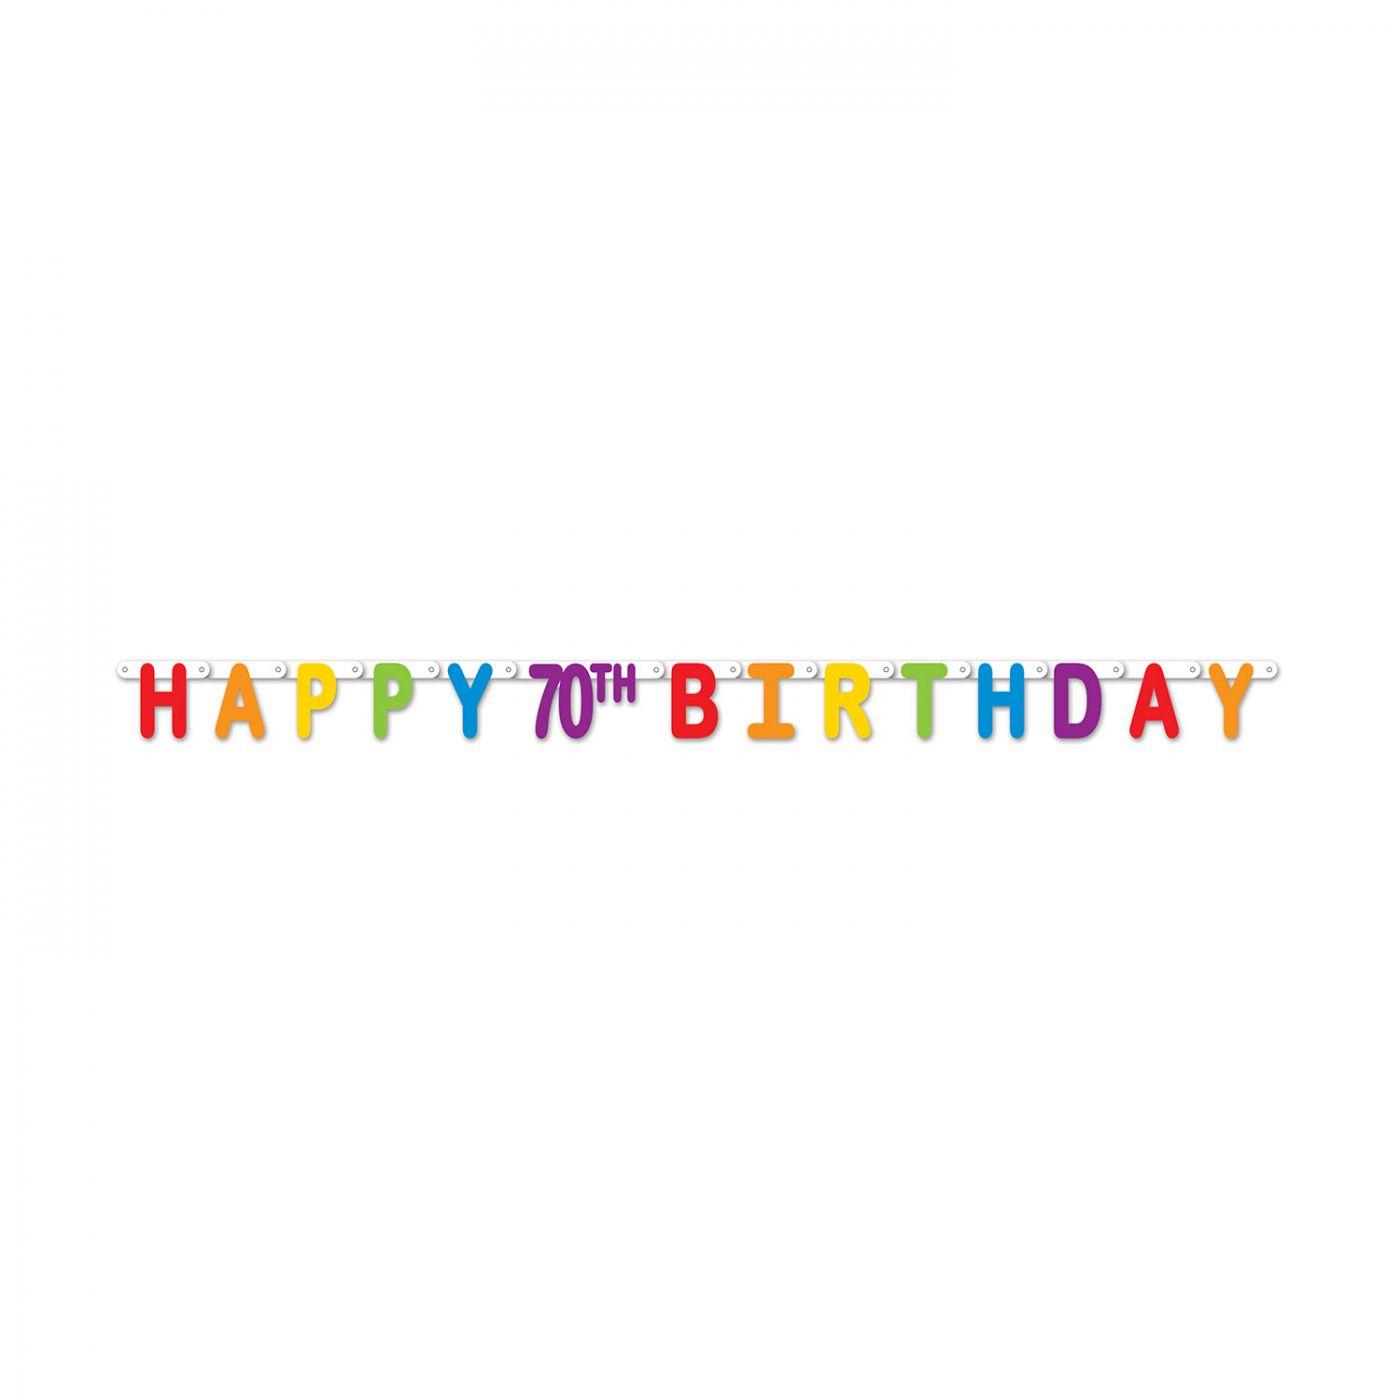 Happy 70th Birthday Streamer image